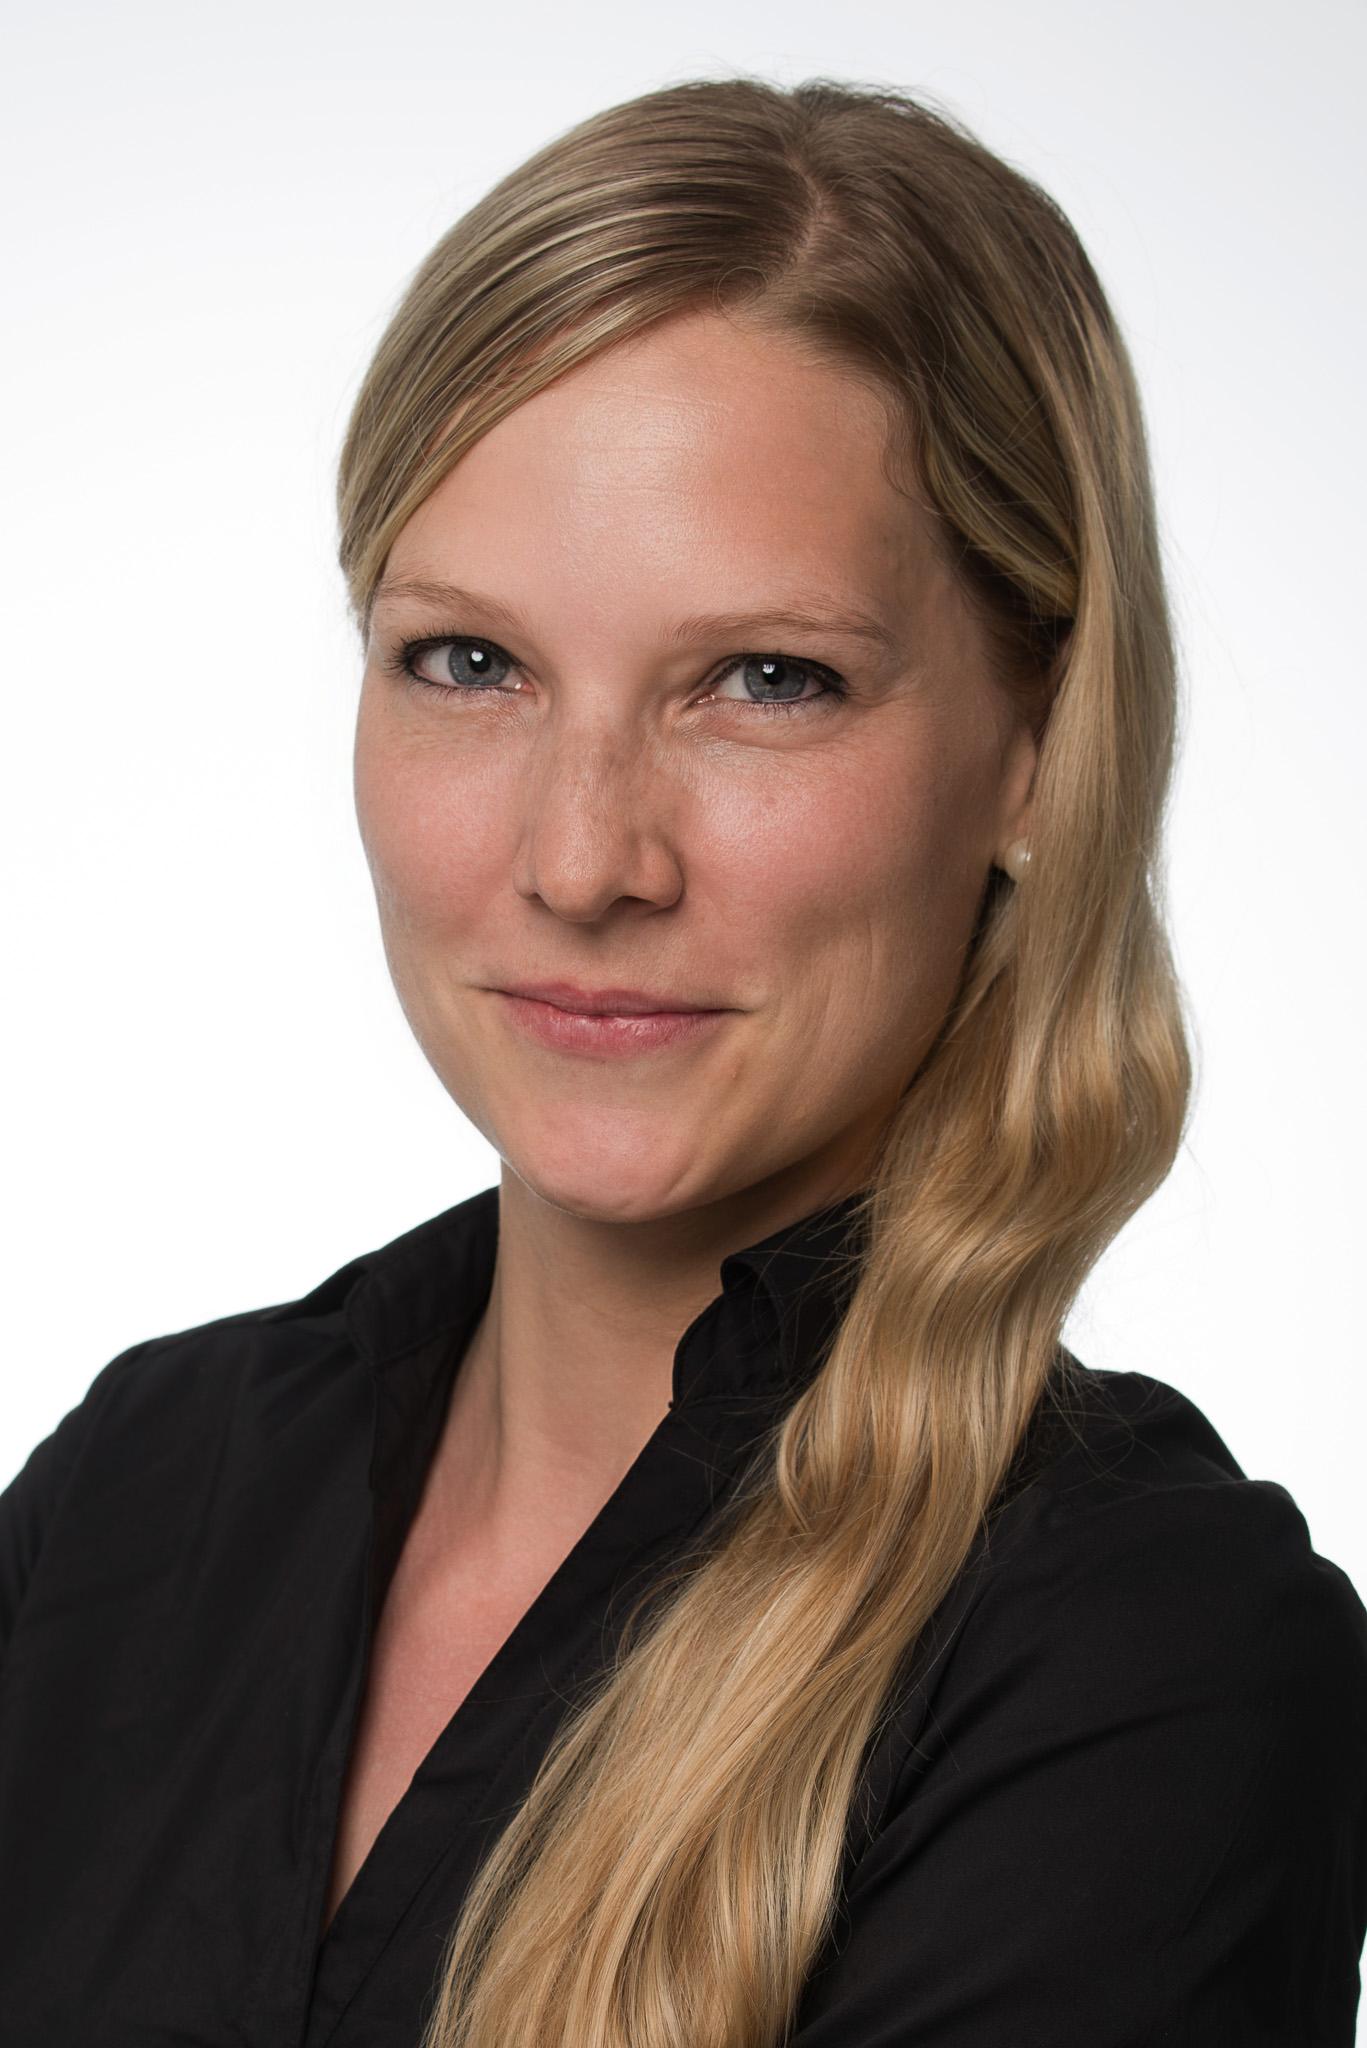 Stefanie Weilenmann